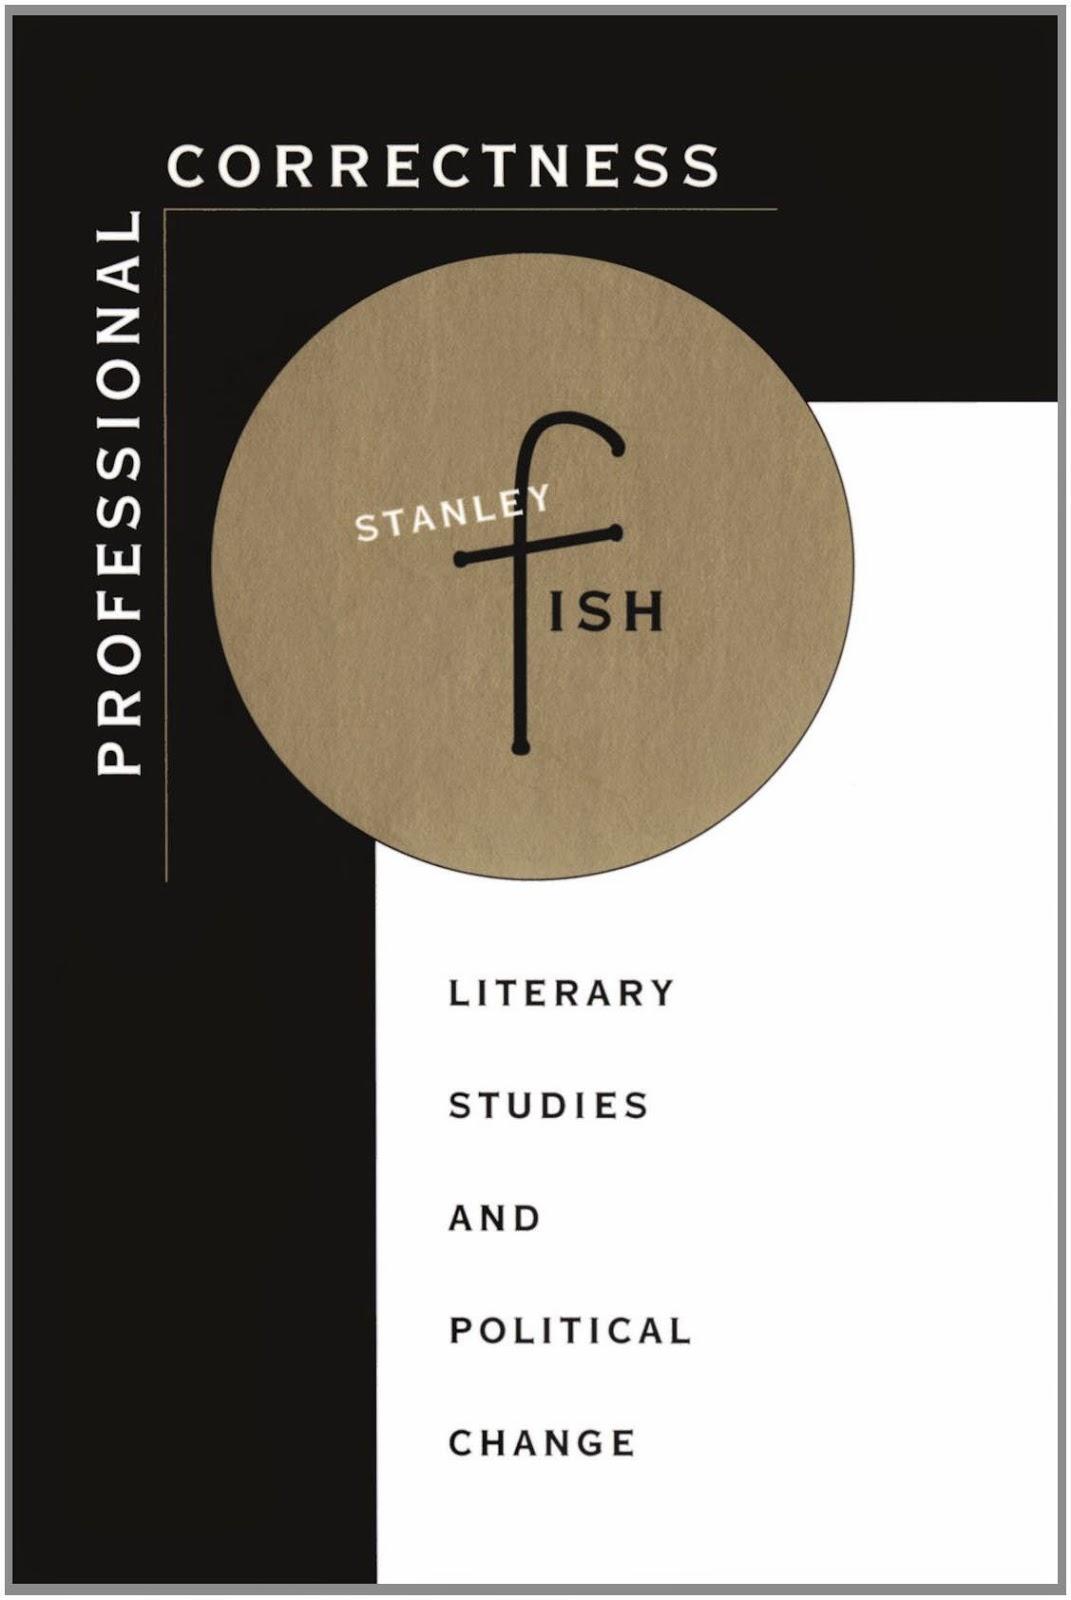 http://www.amazon.com/Professional-Correctness-Literary-Studies-Political/dp/067471220X/ref=sr_1_11?s=books&ie=UTF8&qid=1402450284&sr=1-11